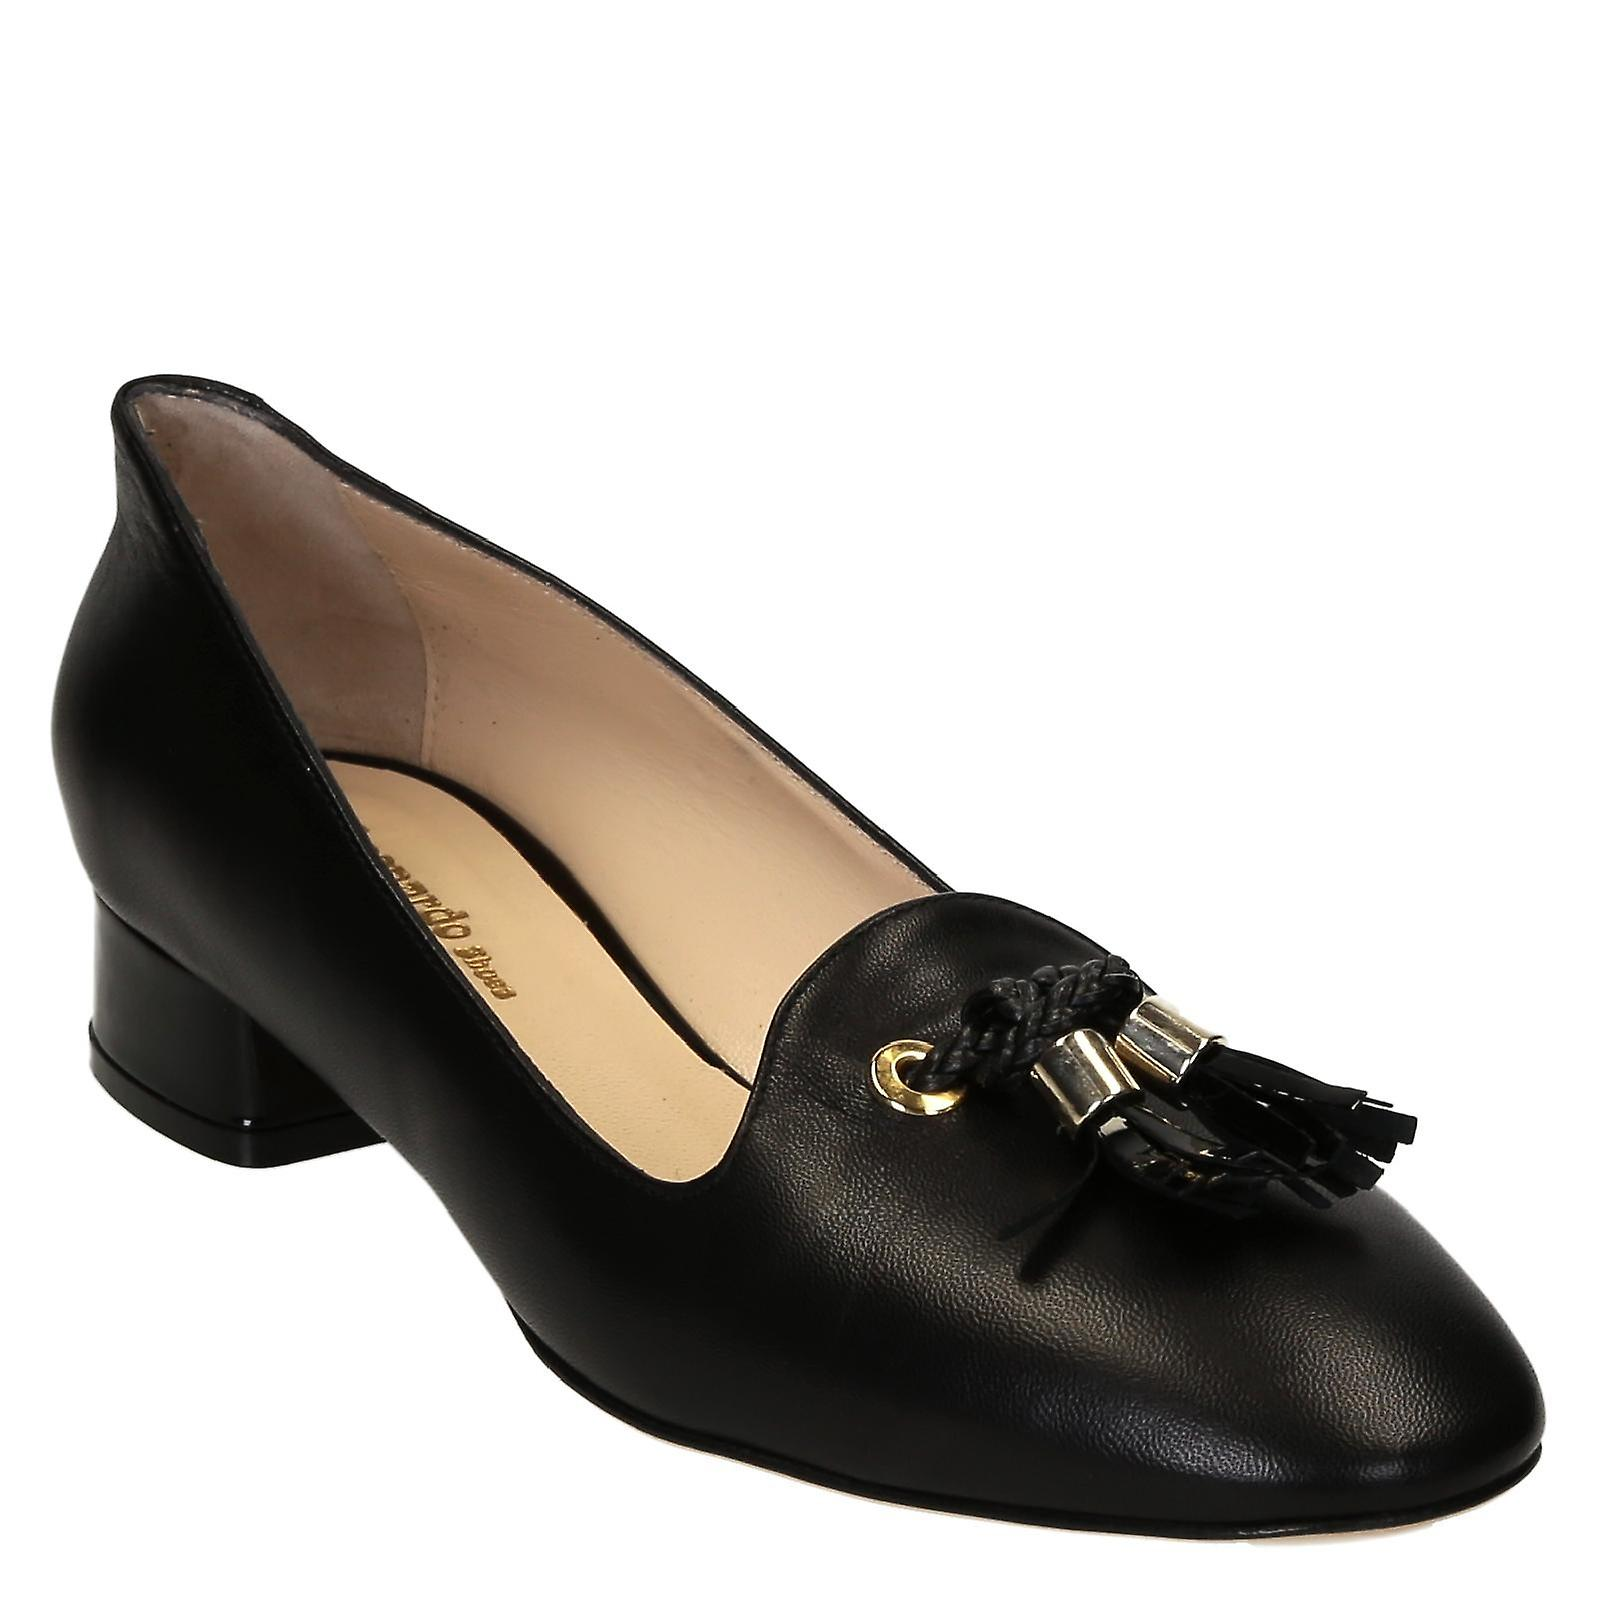 heels shoes leather low Handmade pumps soft black wnIqxYPZ